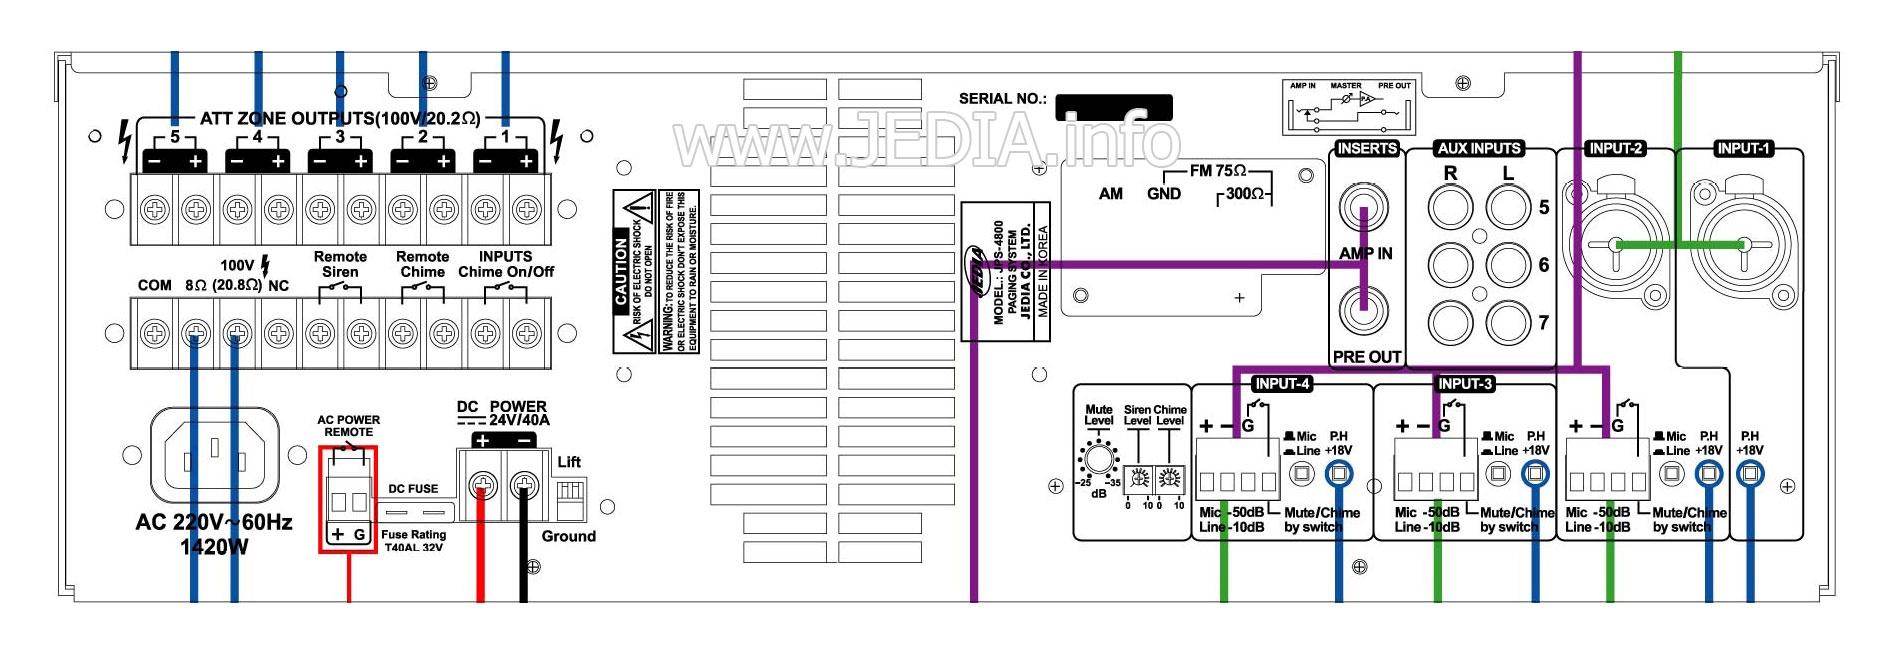 Ht1621 схема подключения